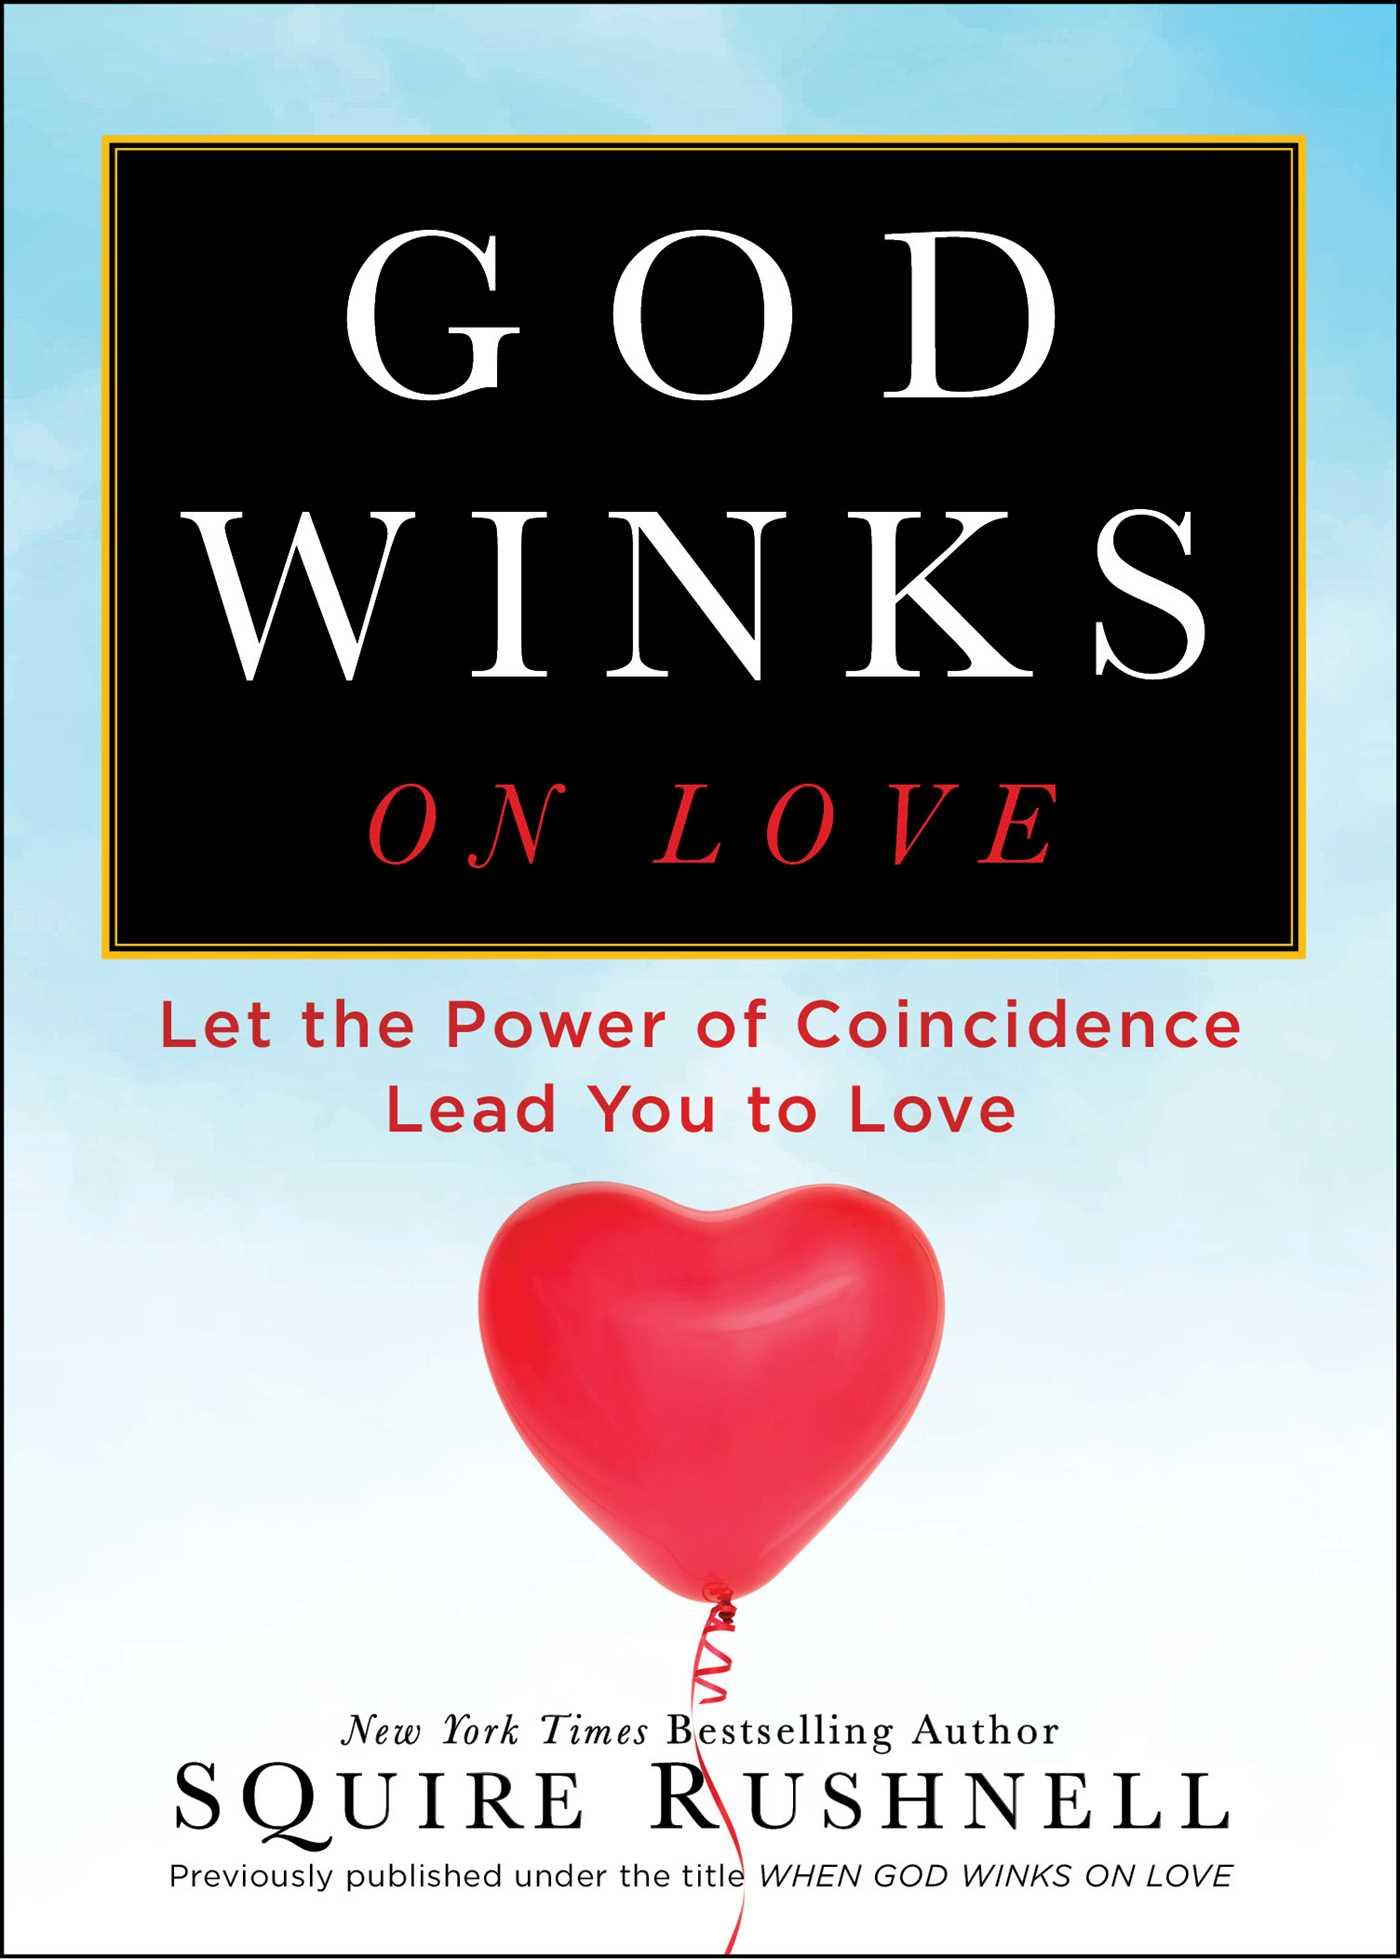 When god winks on love 9781416556381 hr